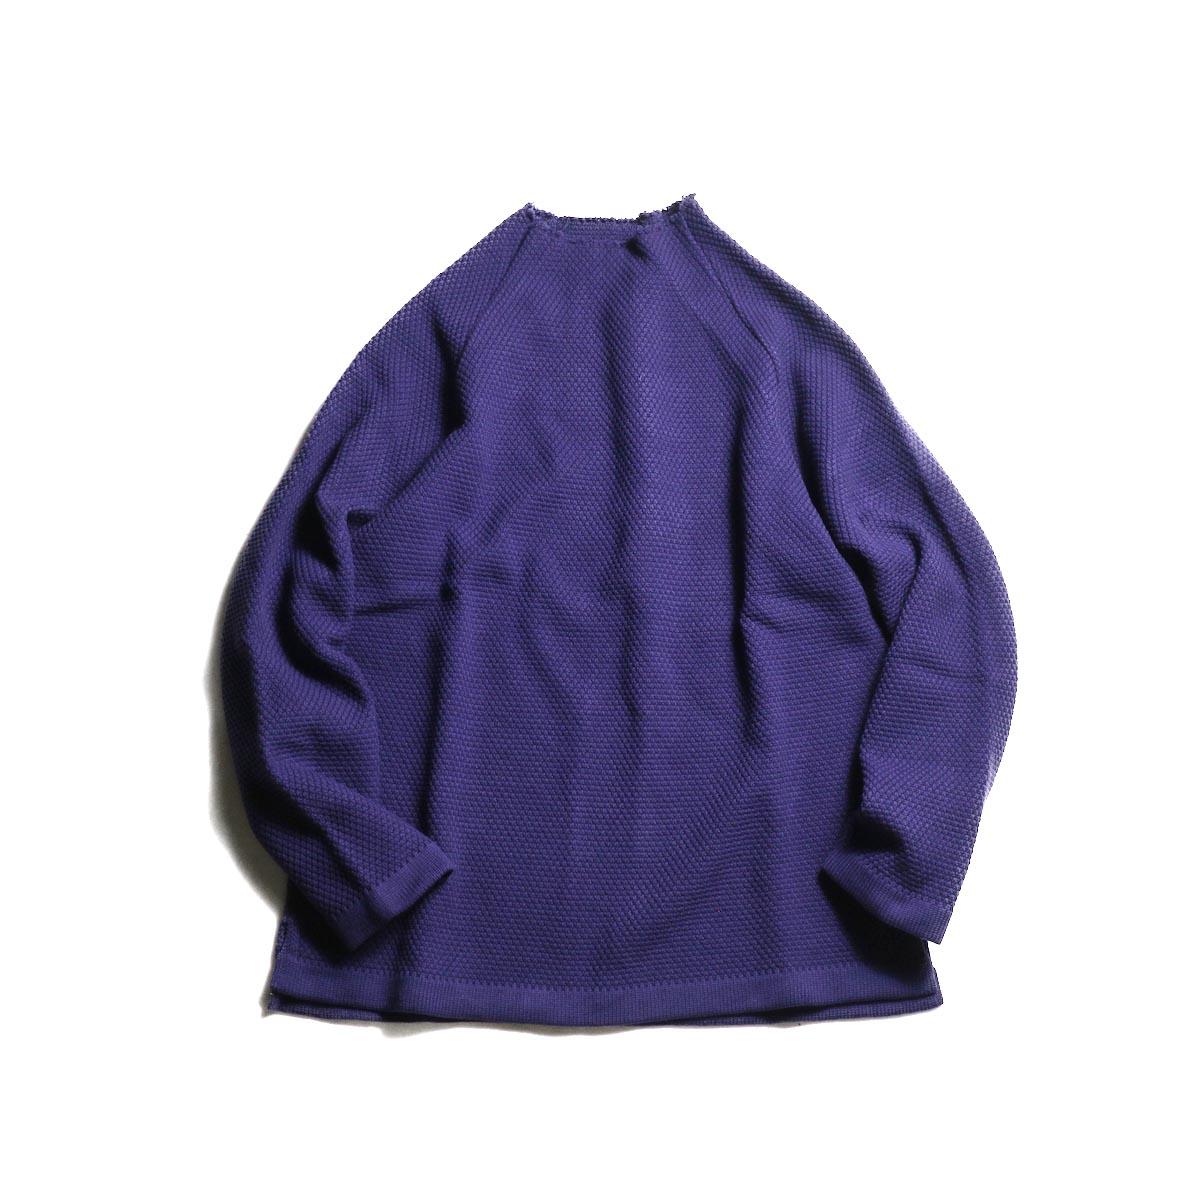 CURLY / KIPS BTL SWEATER (Purple)